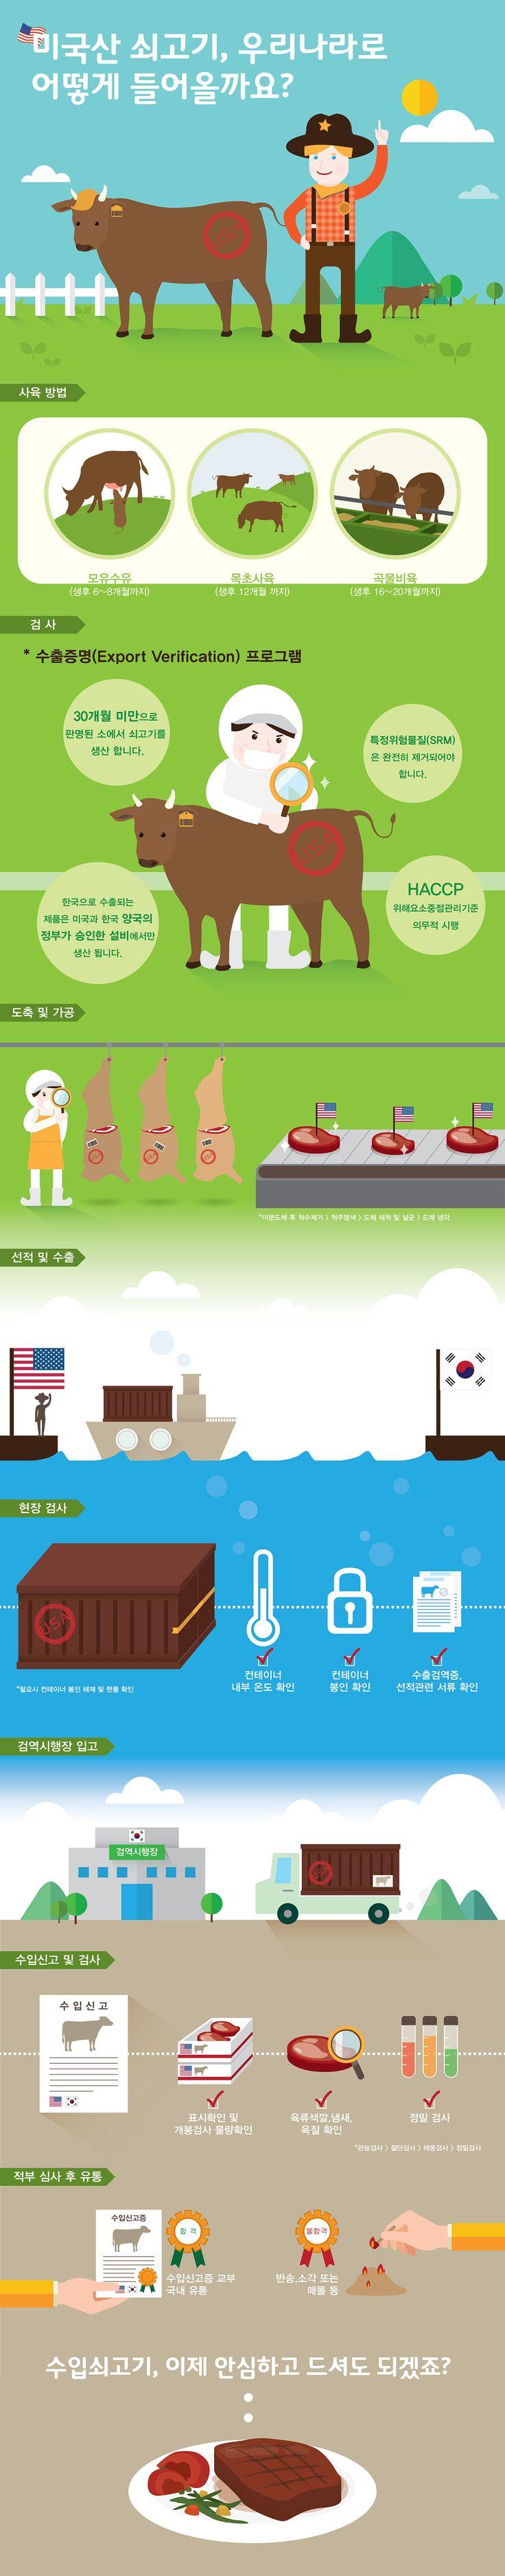 [Infographic] 미국산 쇠고기 수입에 관한 인포그래픽